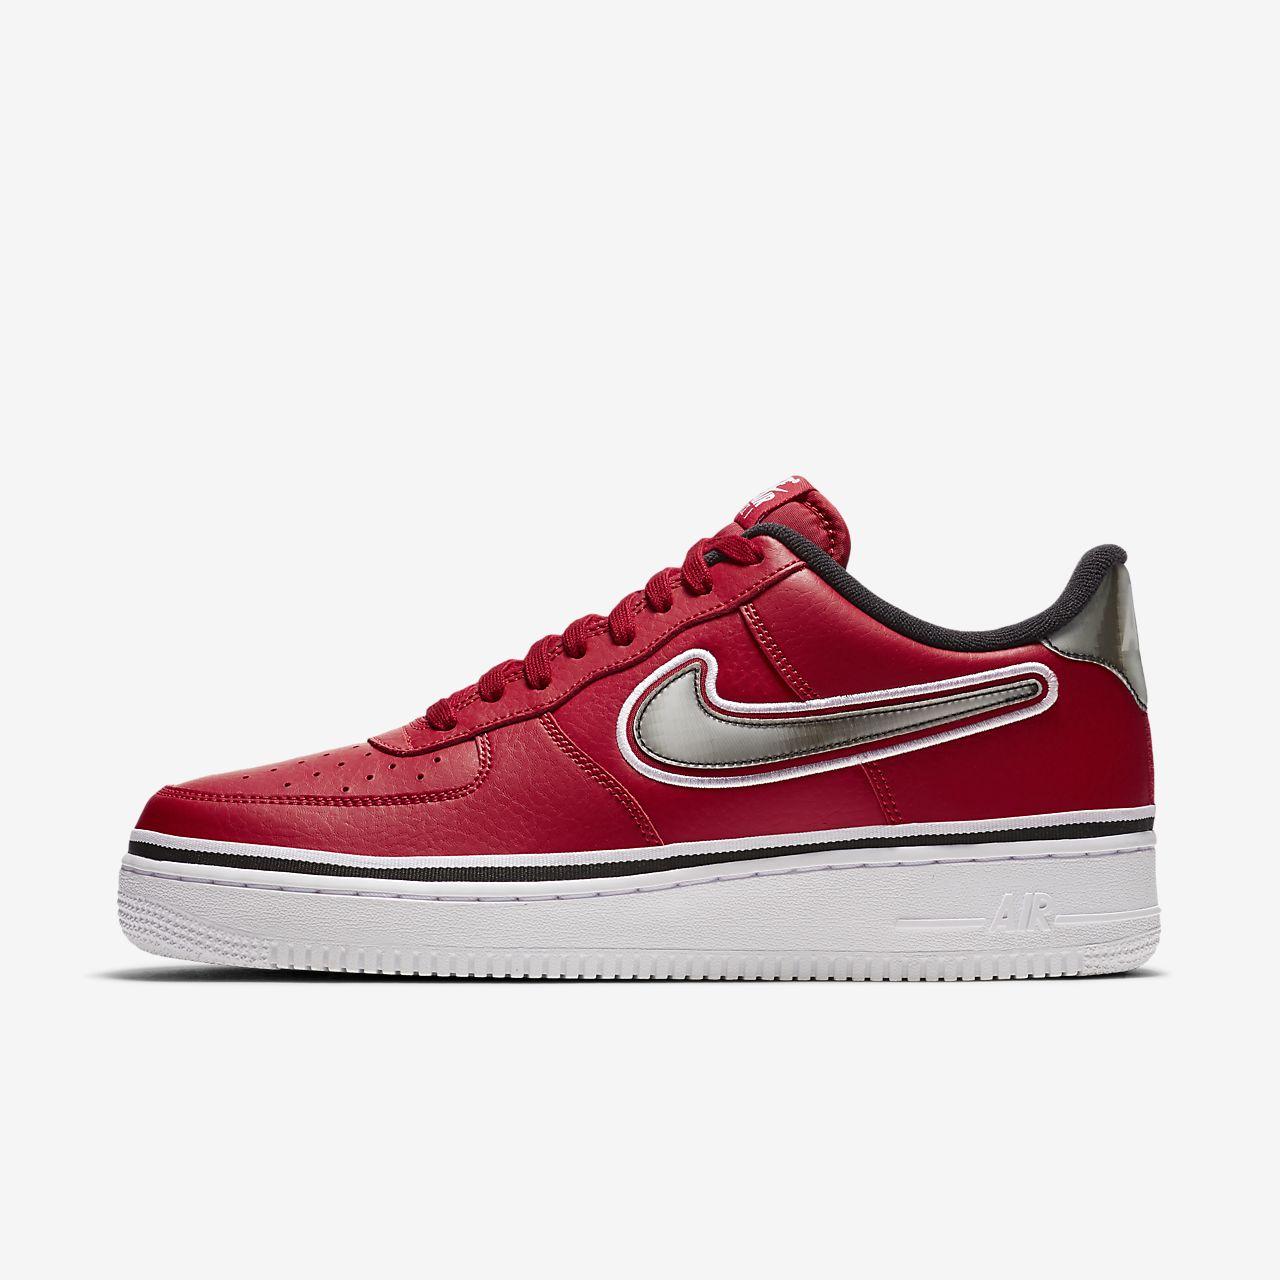 check out 77a7d ba3c9 ... Nike Air Force 1 NBA Low (Chicago Bulls)-sko til mænd